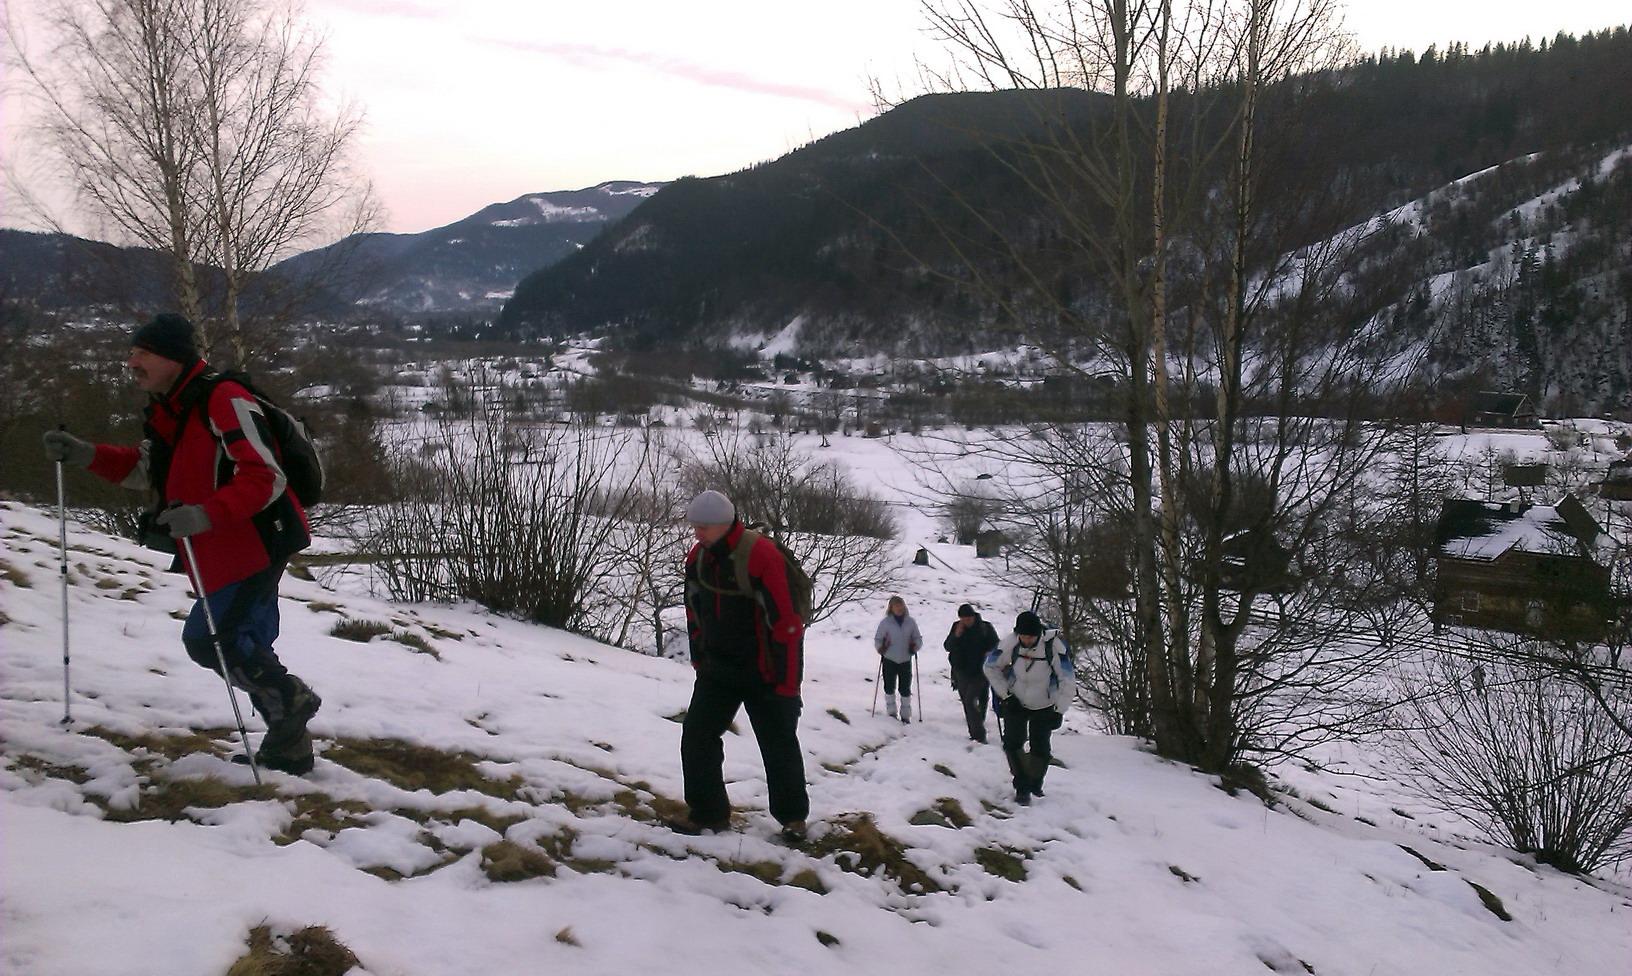 08:30 Початок походу